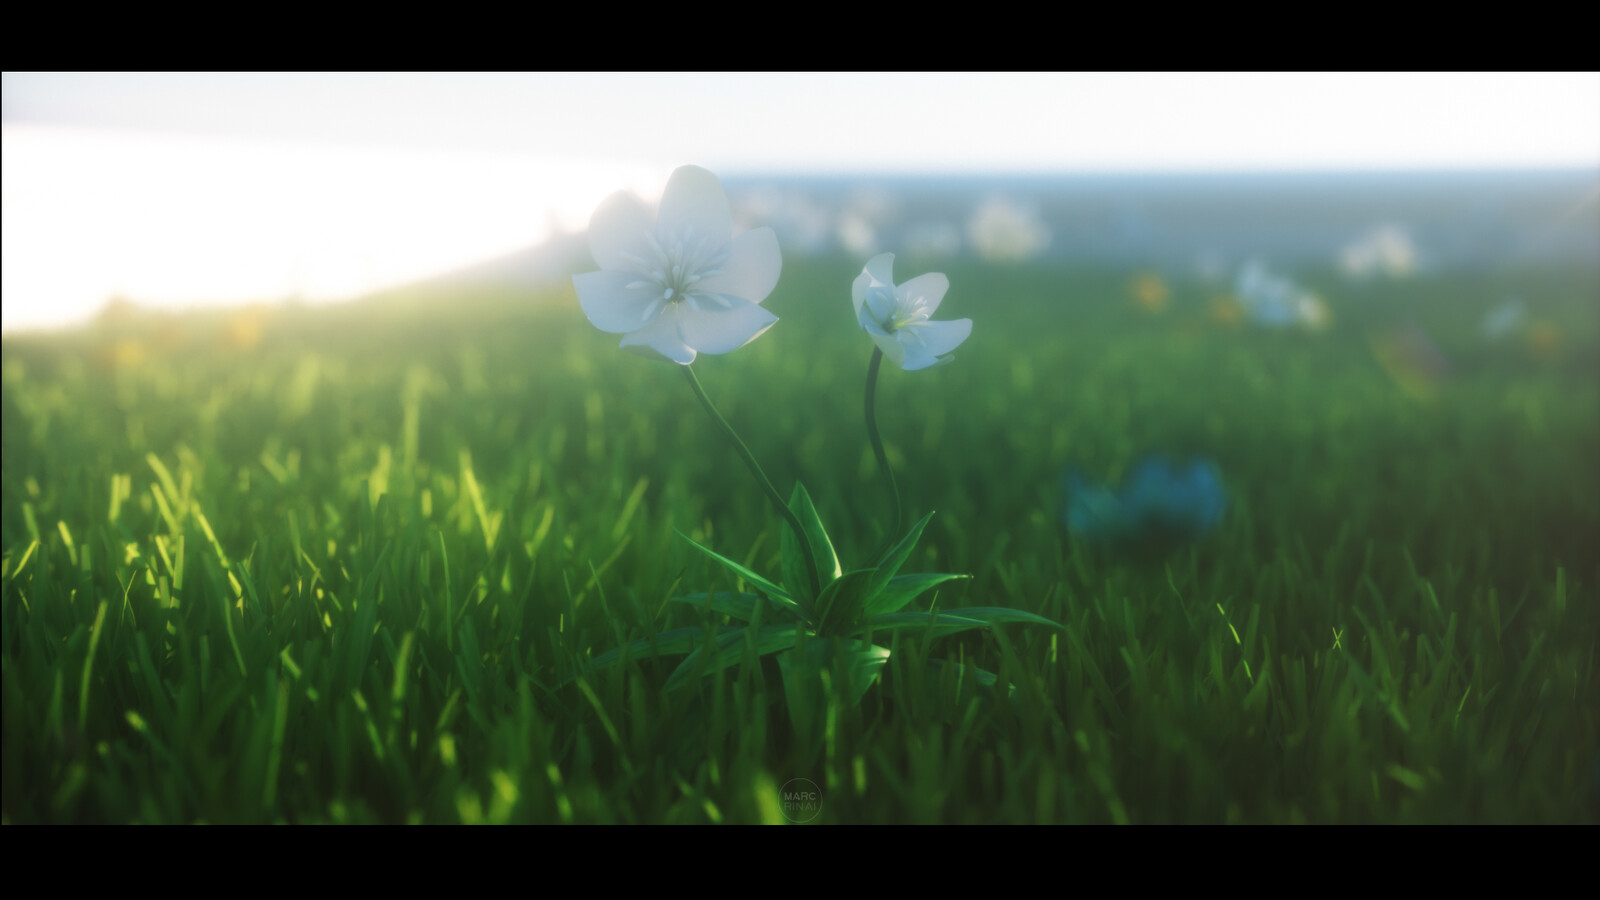 Nirinsow flowers